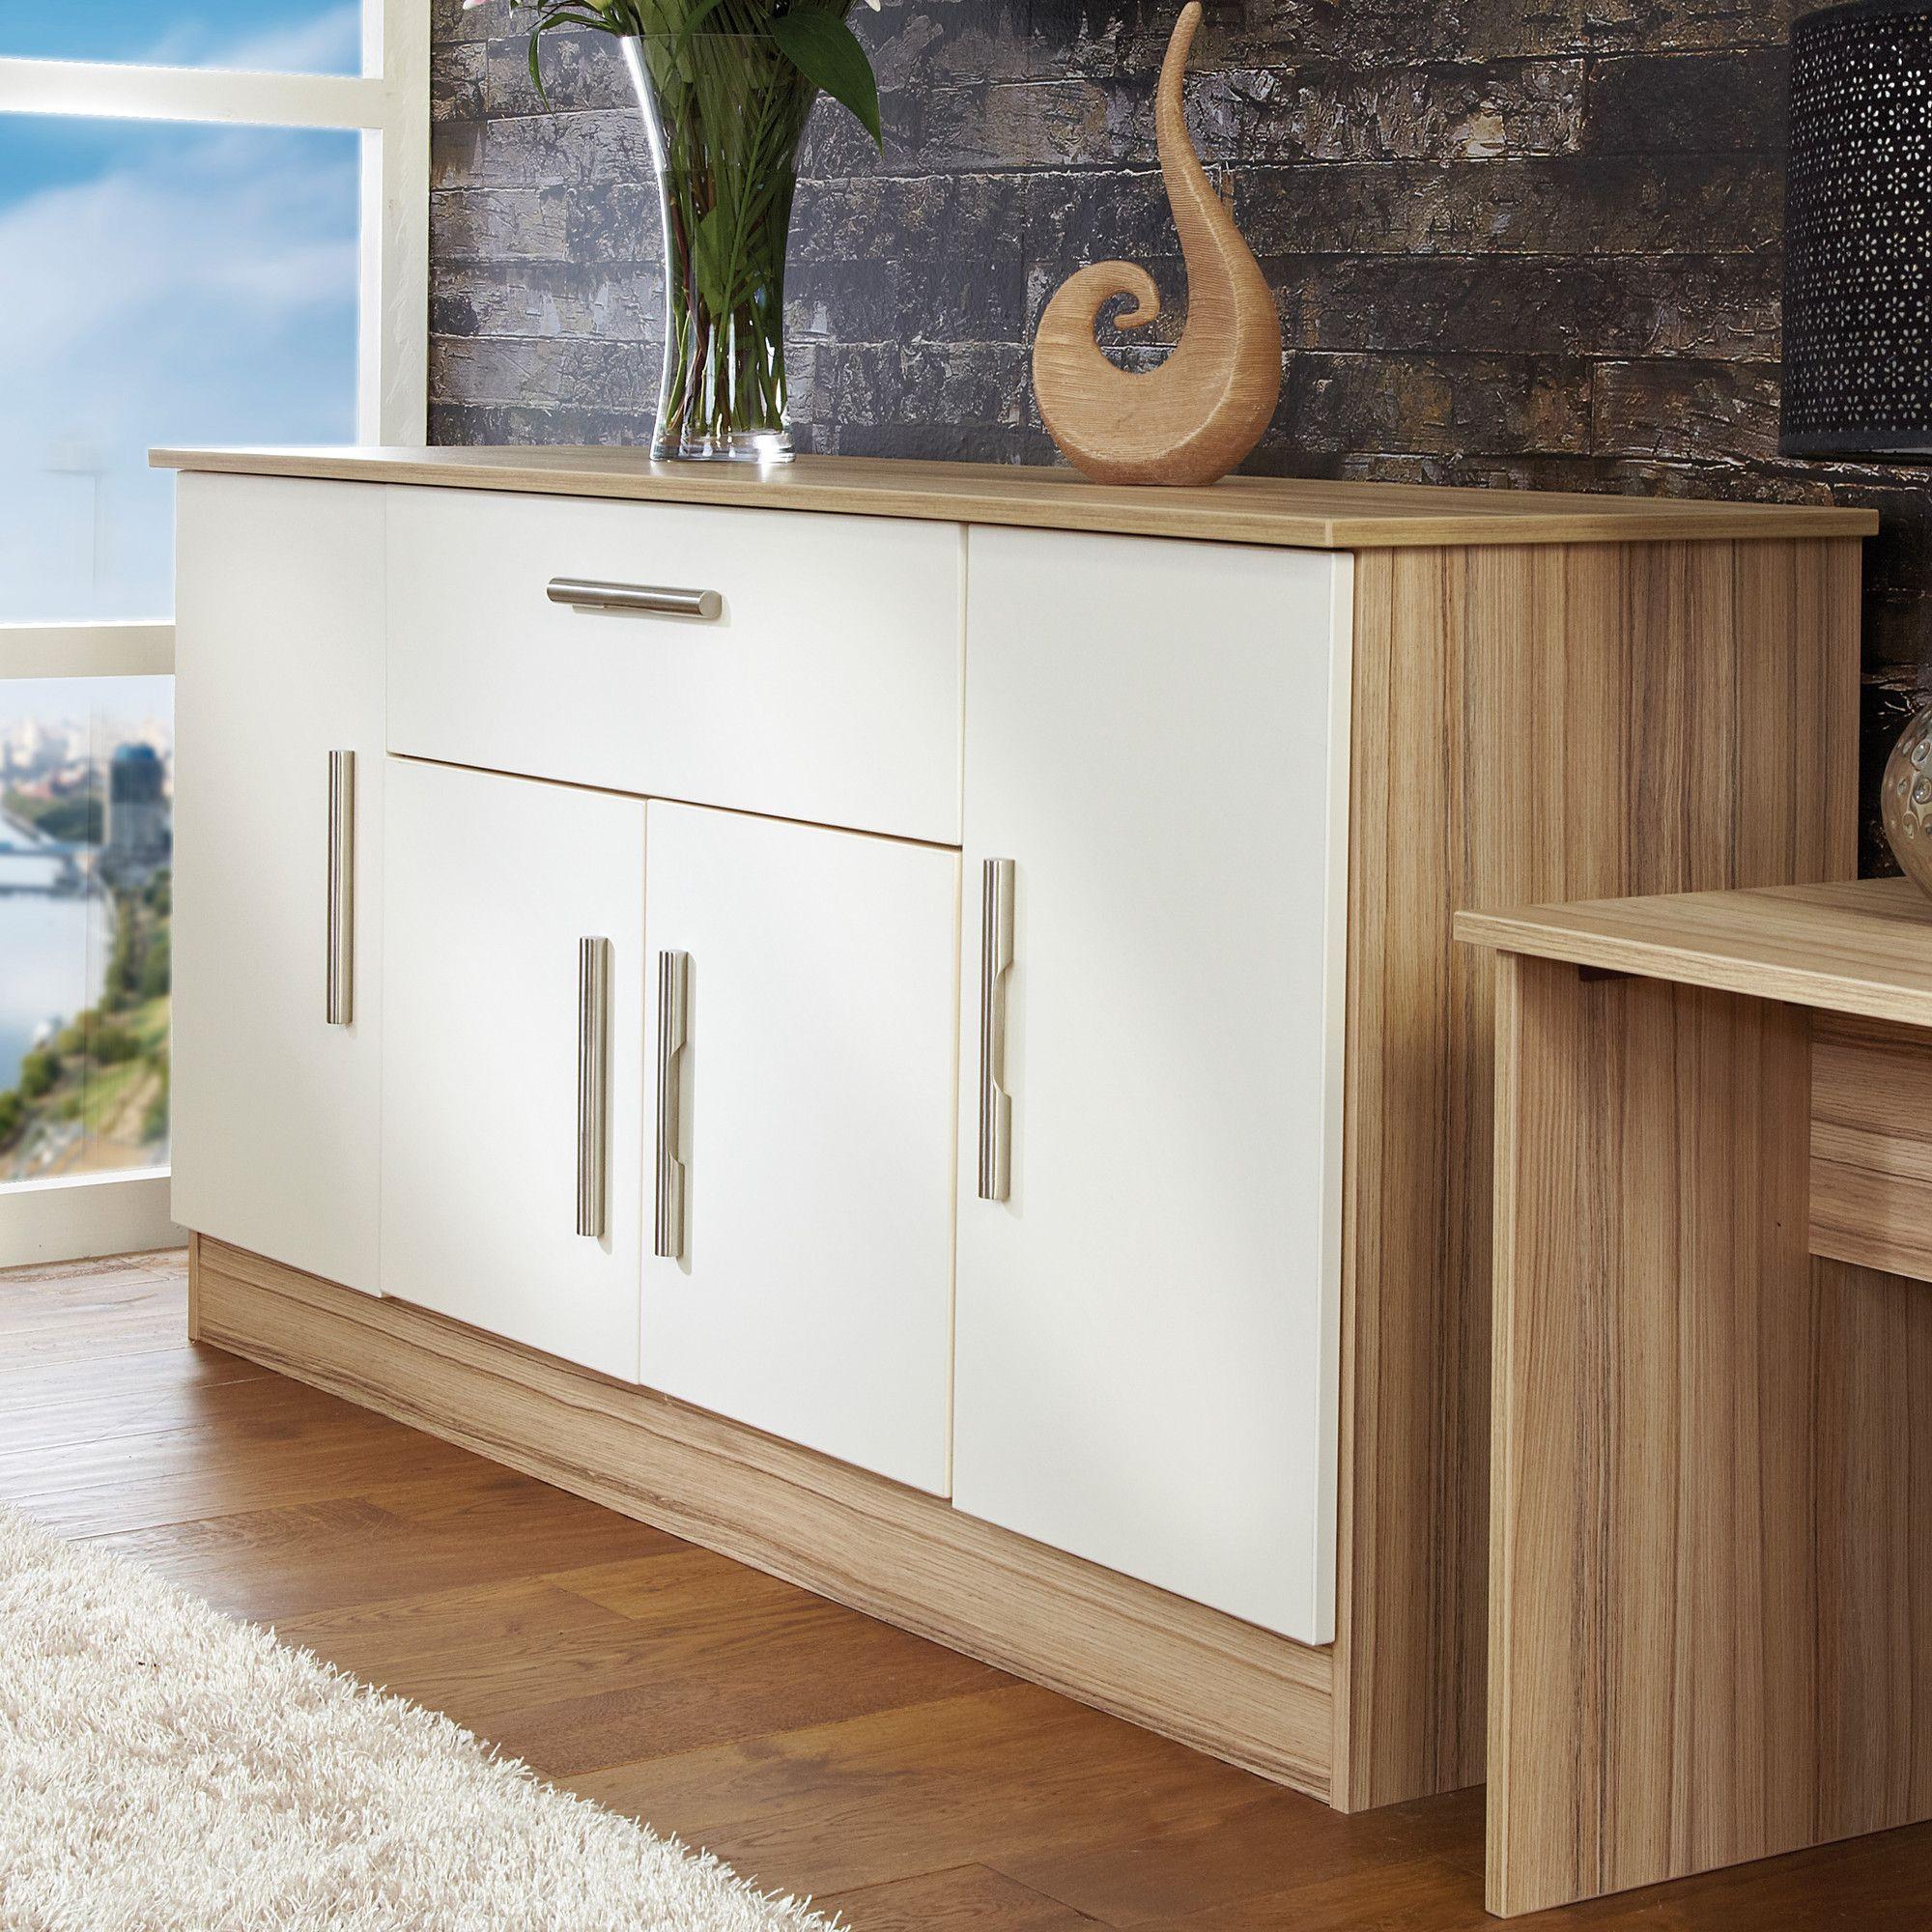 Welcome Furniture Living Room Wide 4 Door / 1Drawer Unit - Vanilla/Cocobola at Tescos Direct